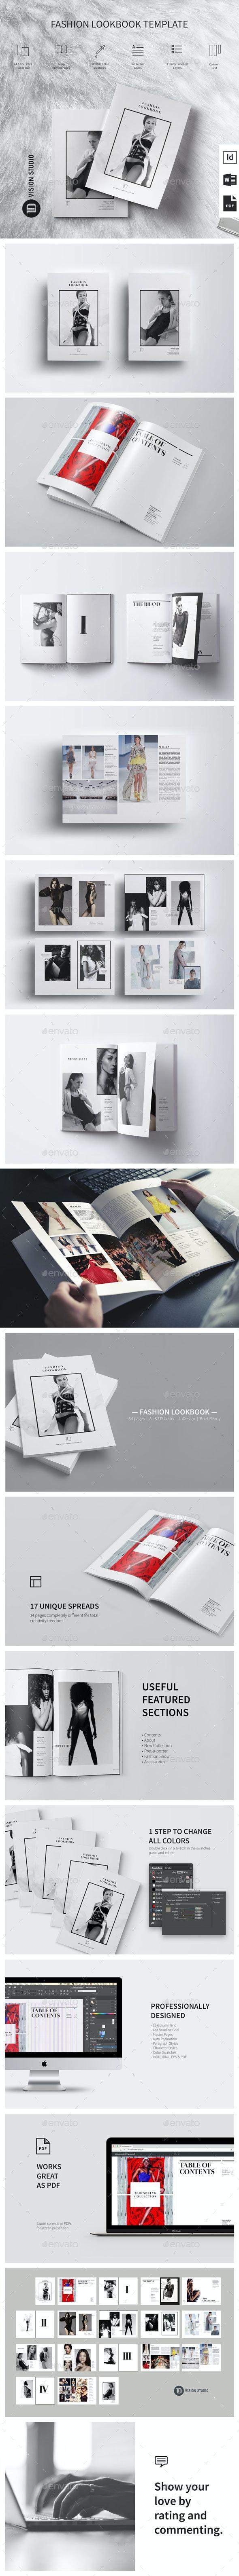 Fashion Lookbook 001 - Catalogs Brochures